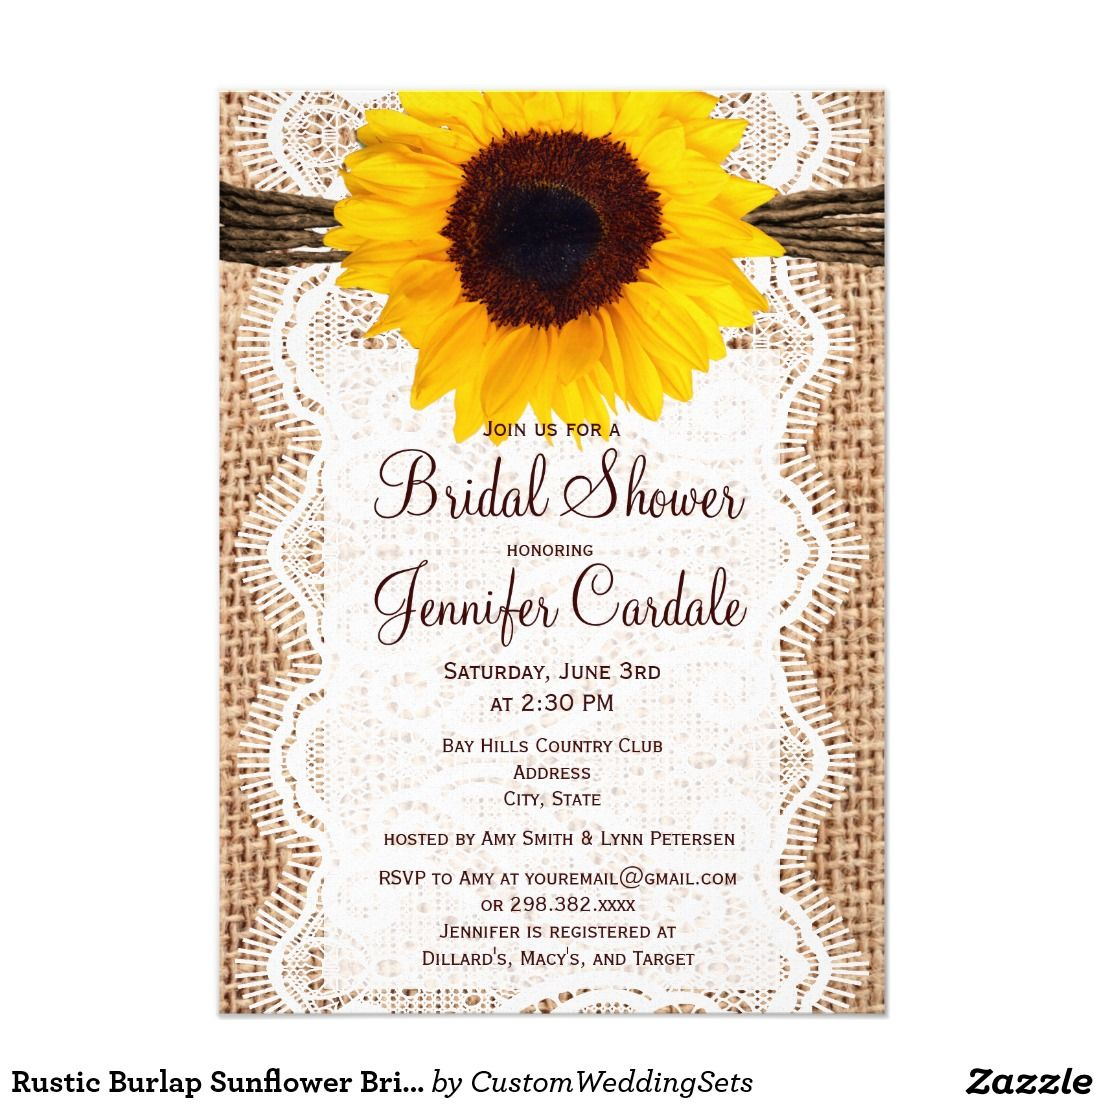 Rustic Burlap Sunflower Bridal Shower Invitations | Bridal Shower ...